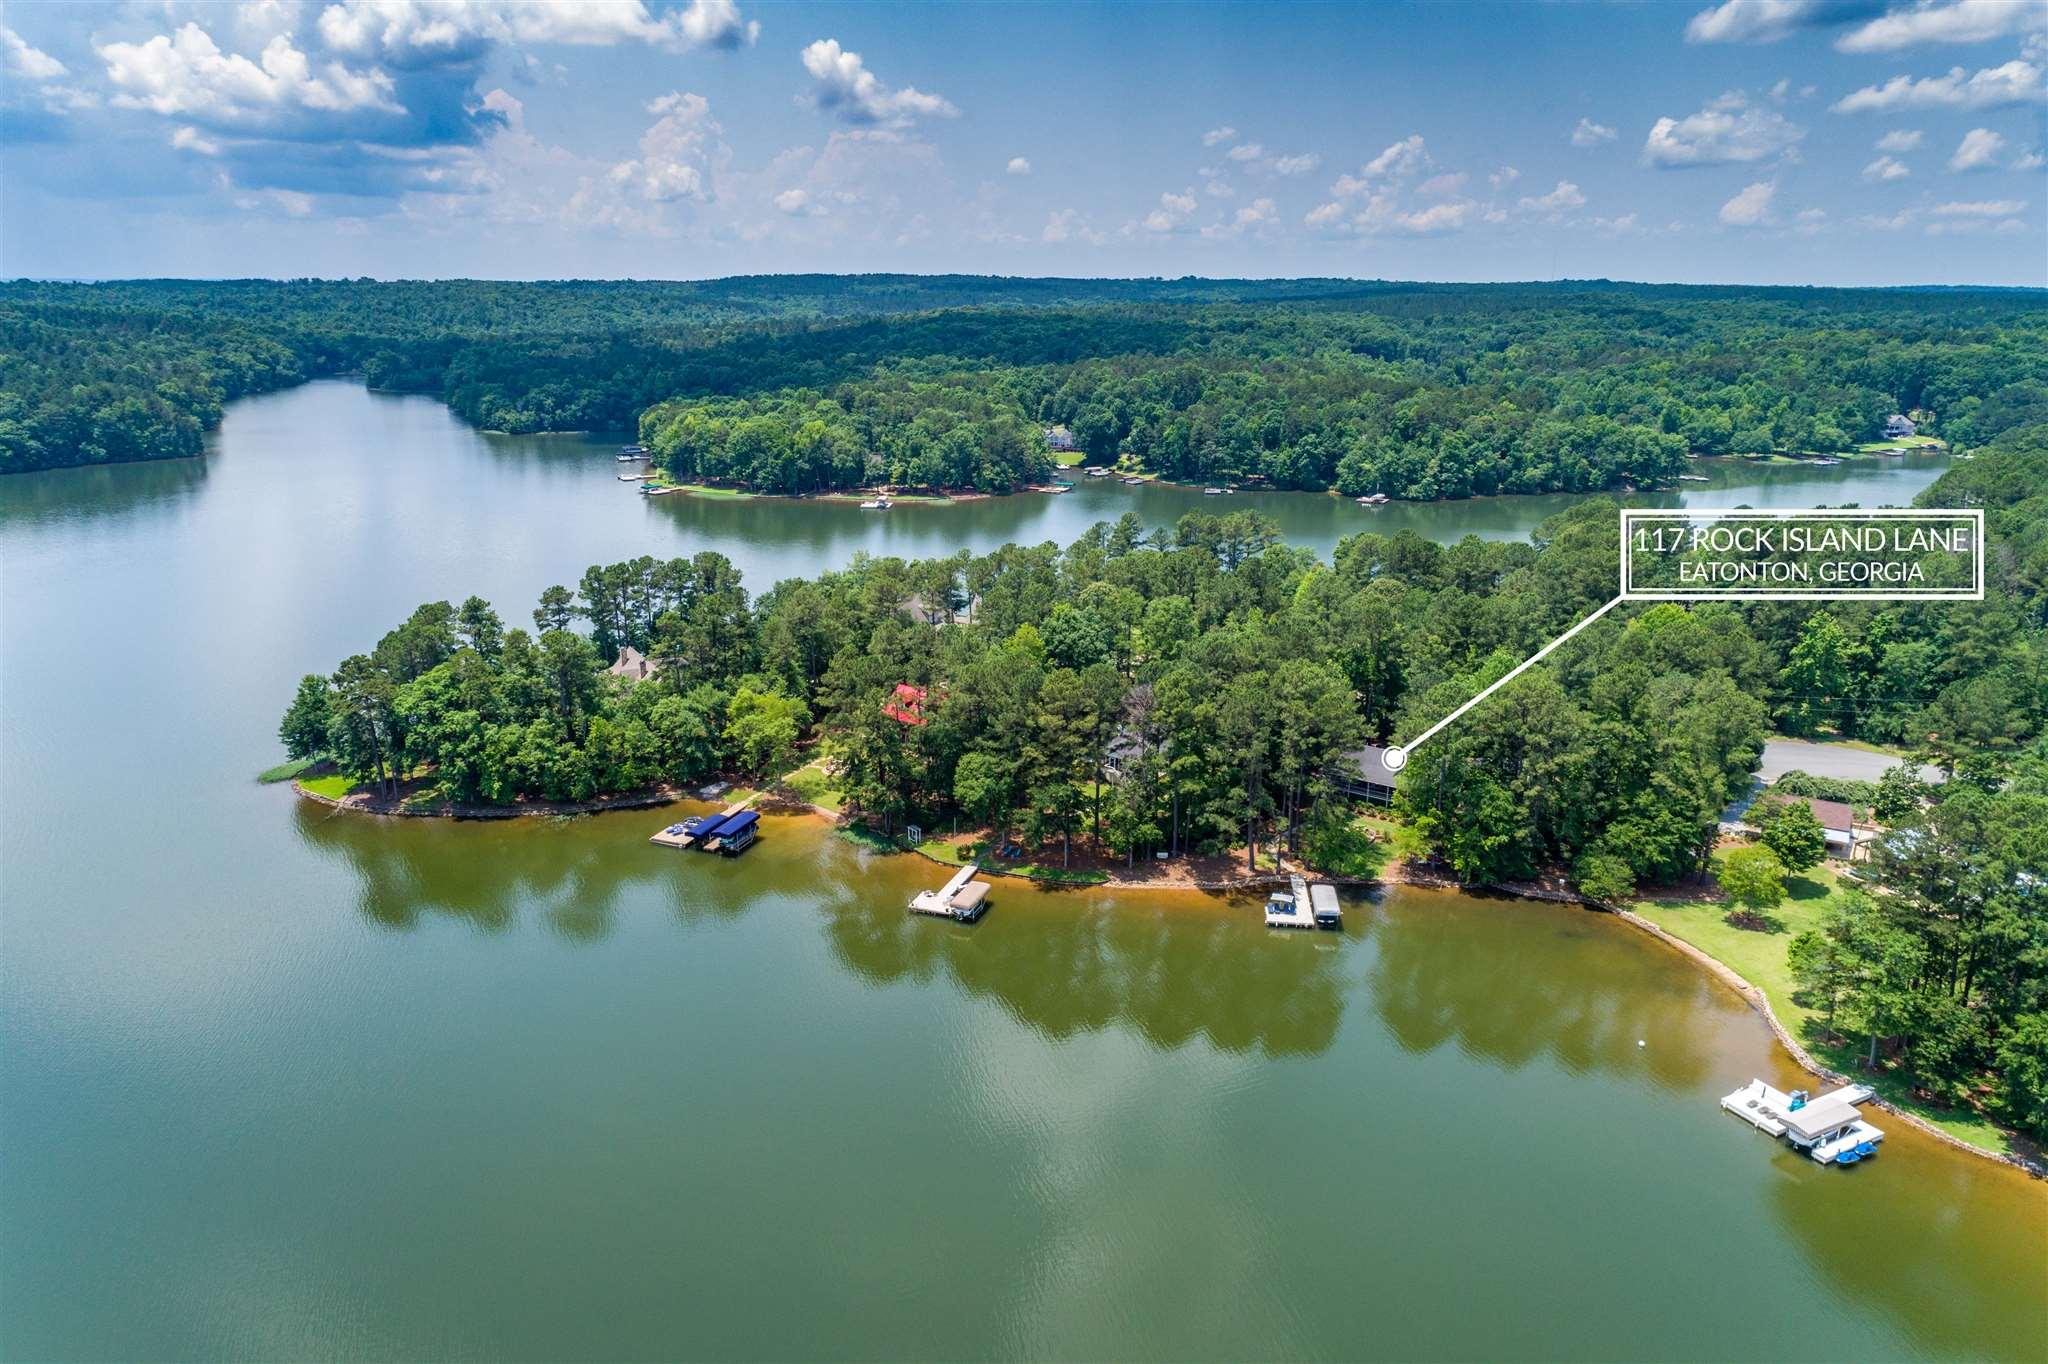 117 ROCK ISLAND LANE, Lake Oconee in Putnam County, GA 31024 Home for Sale